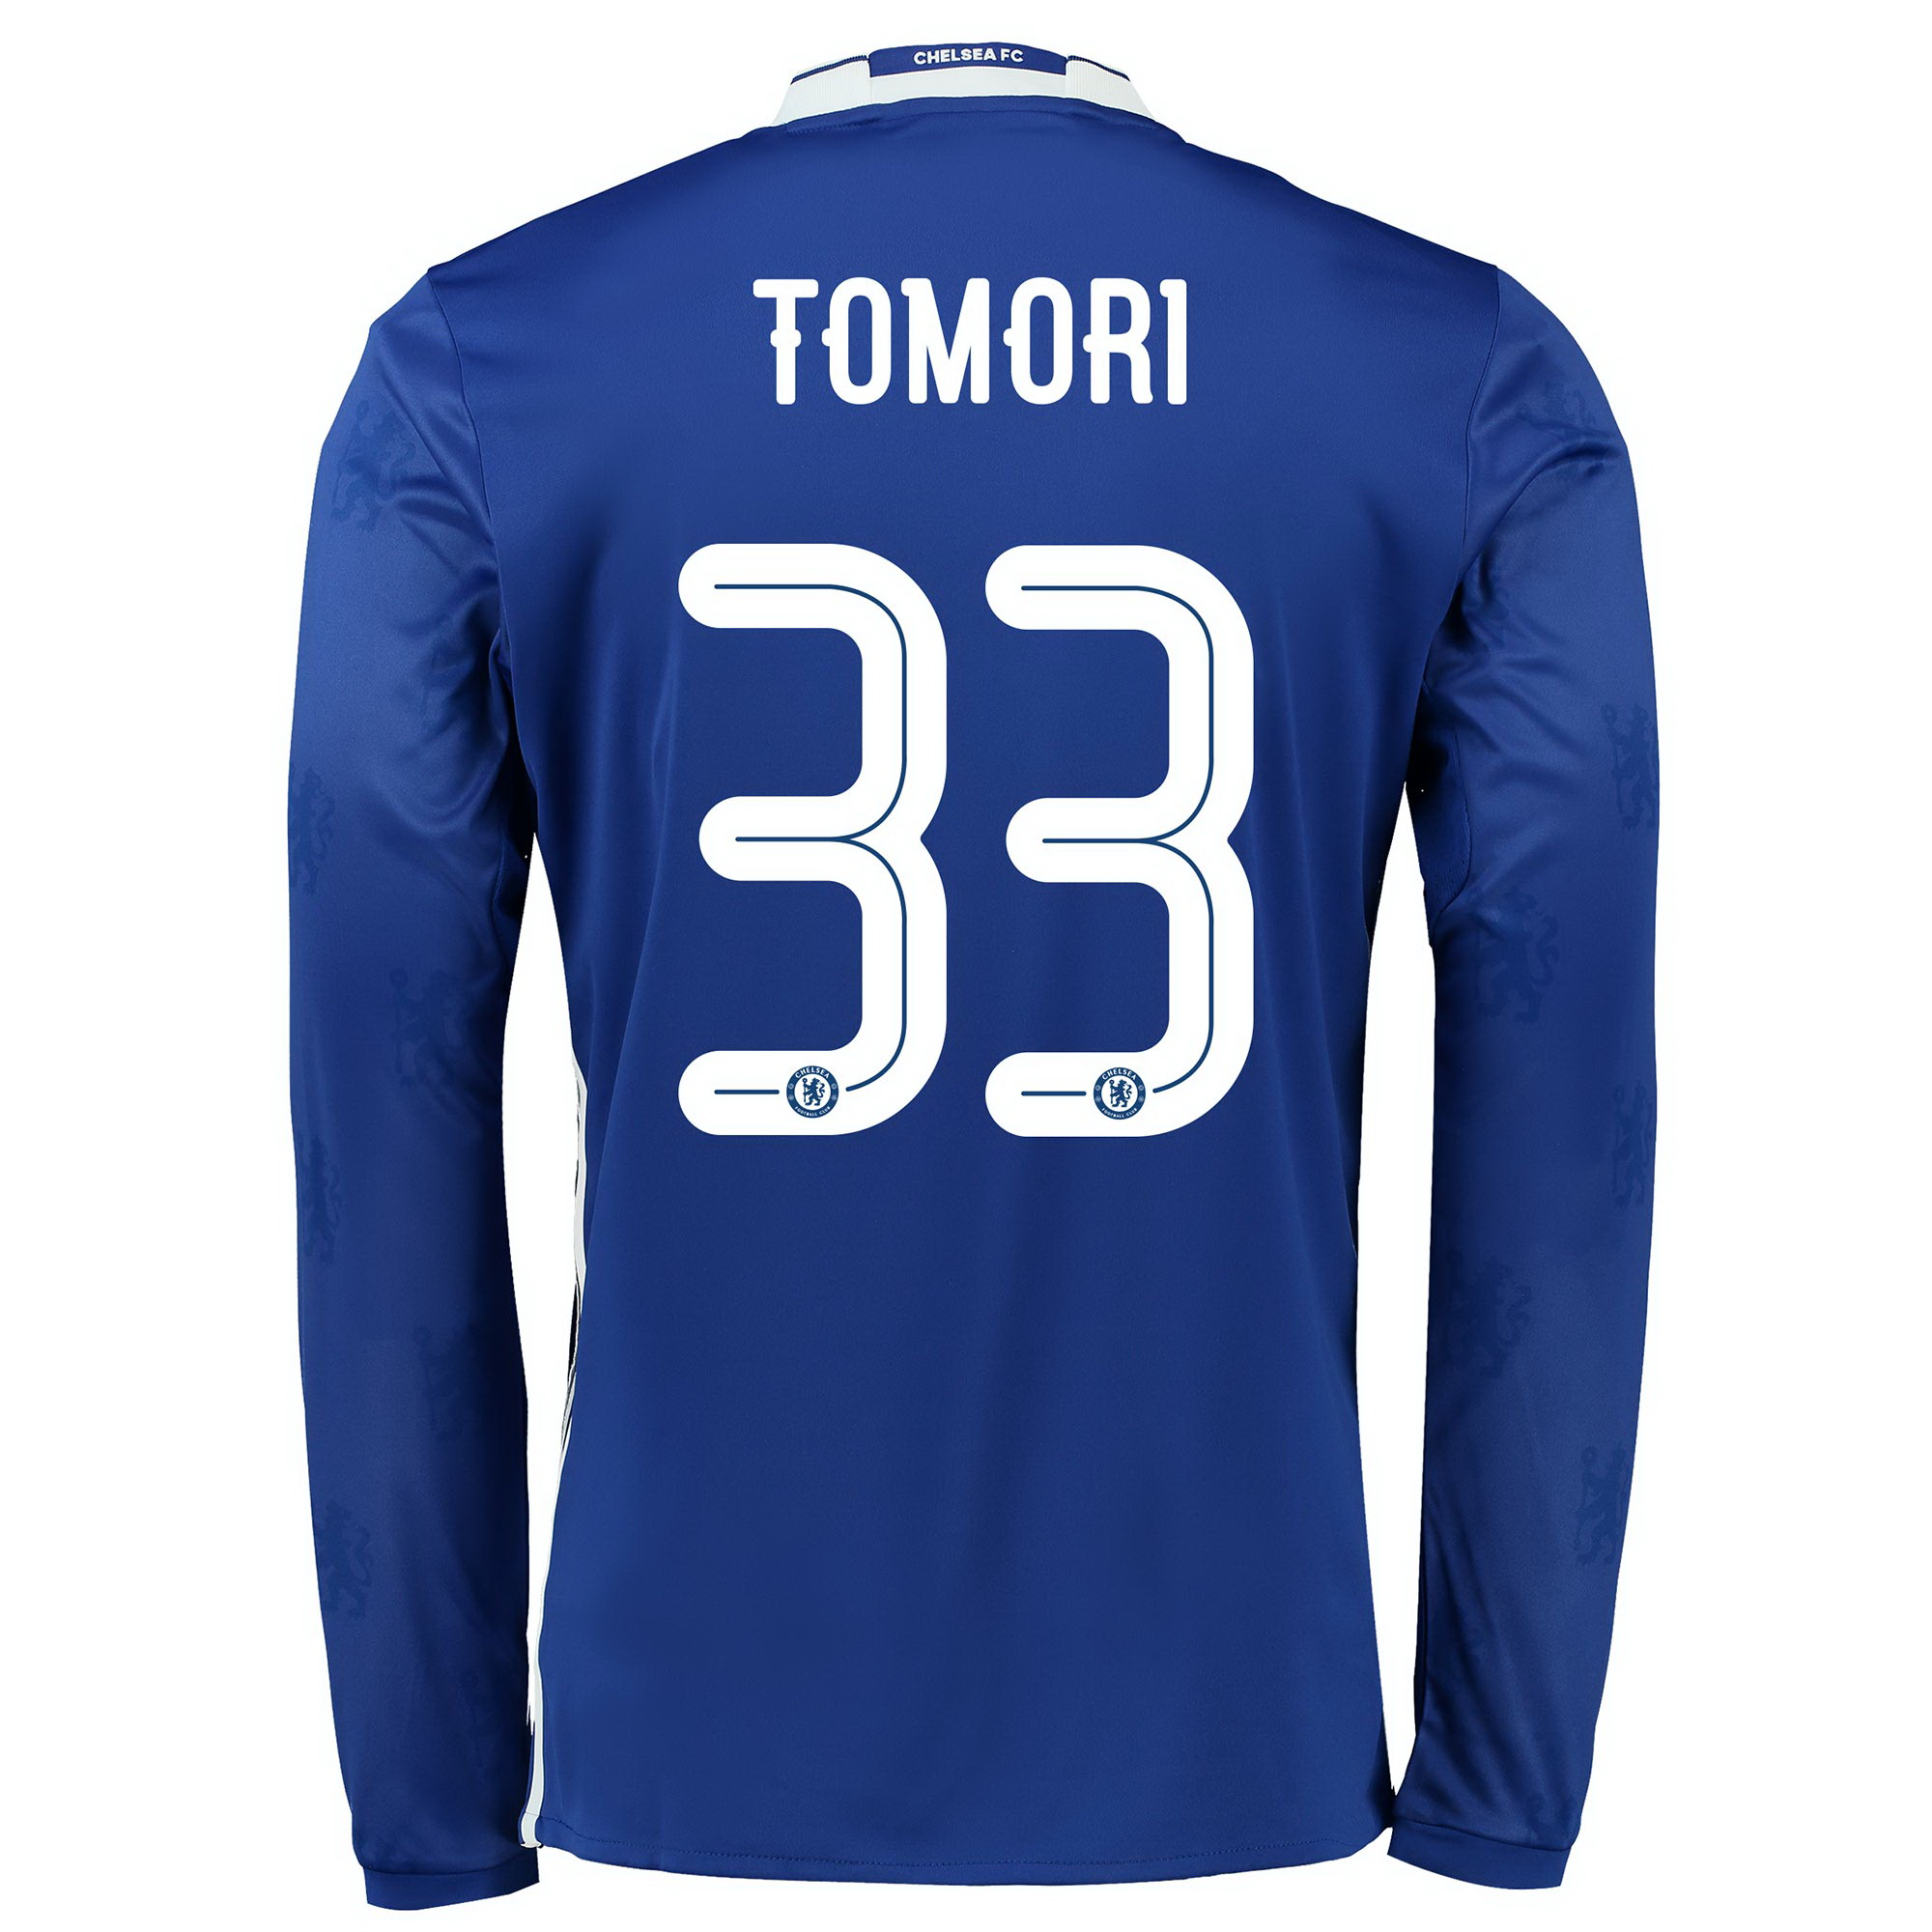 Chelsea Linear Home Shirt 2016-17 - Kids - Long Sleeve with Tomori 33